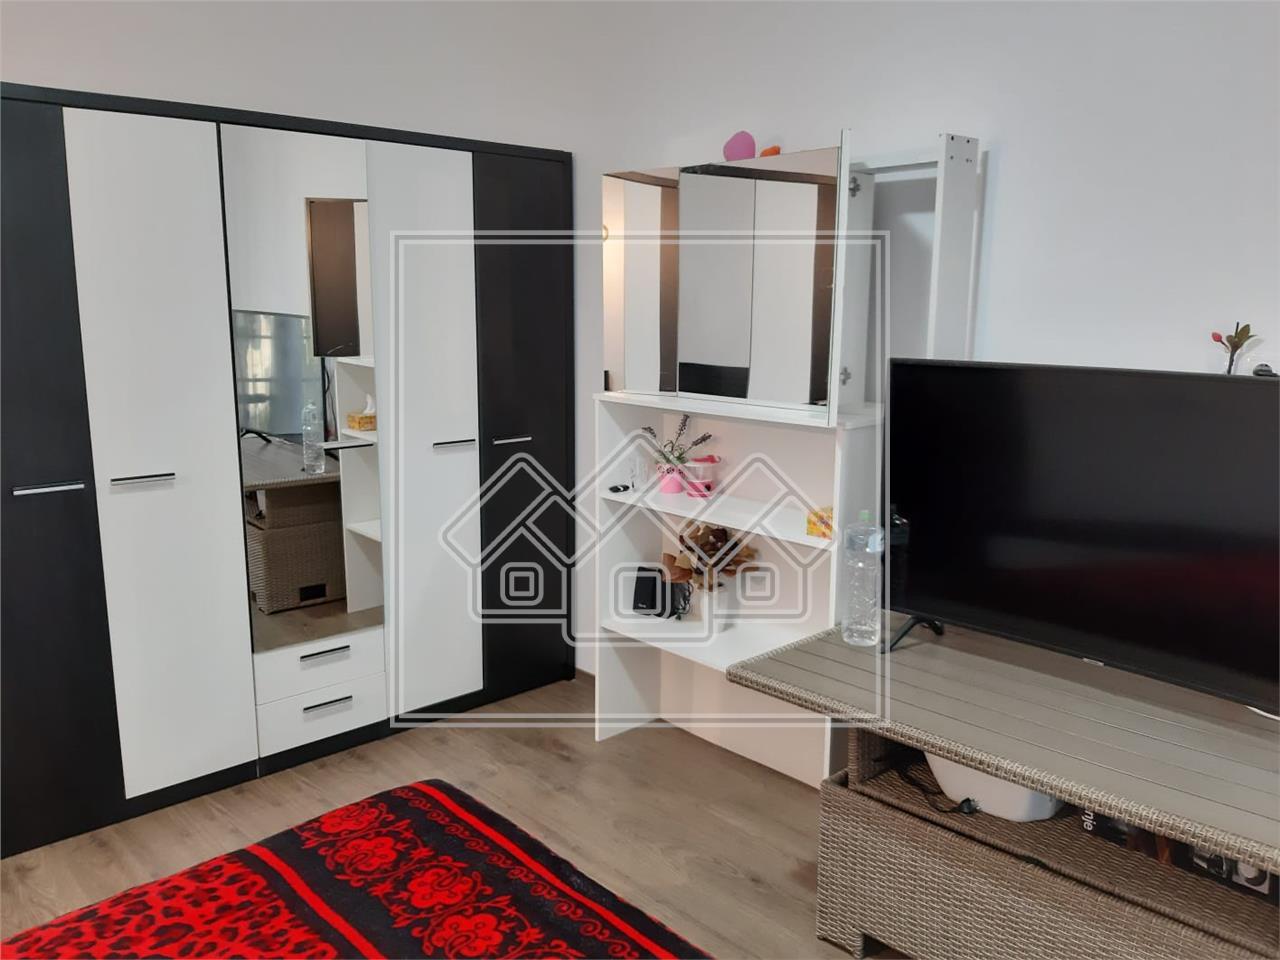 Apartament de inchiriat in Sibiu-3 camere-mobilat si utilat-Z.Selimbar